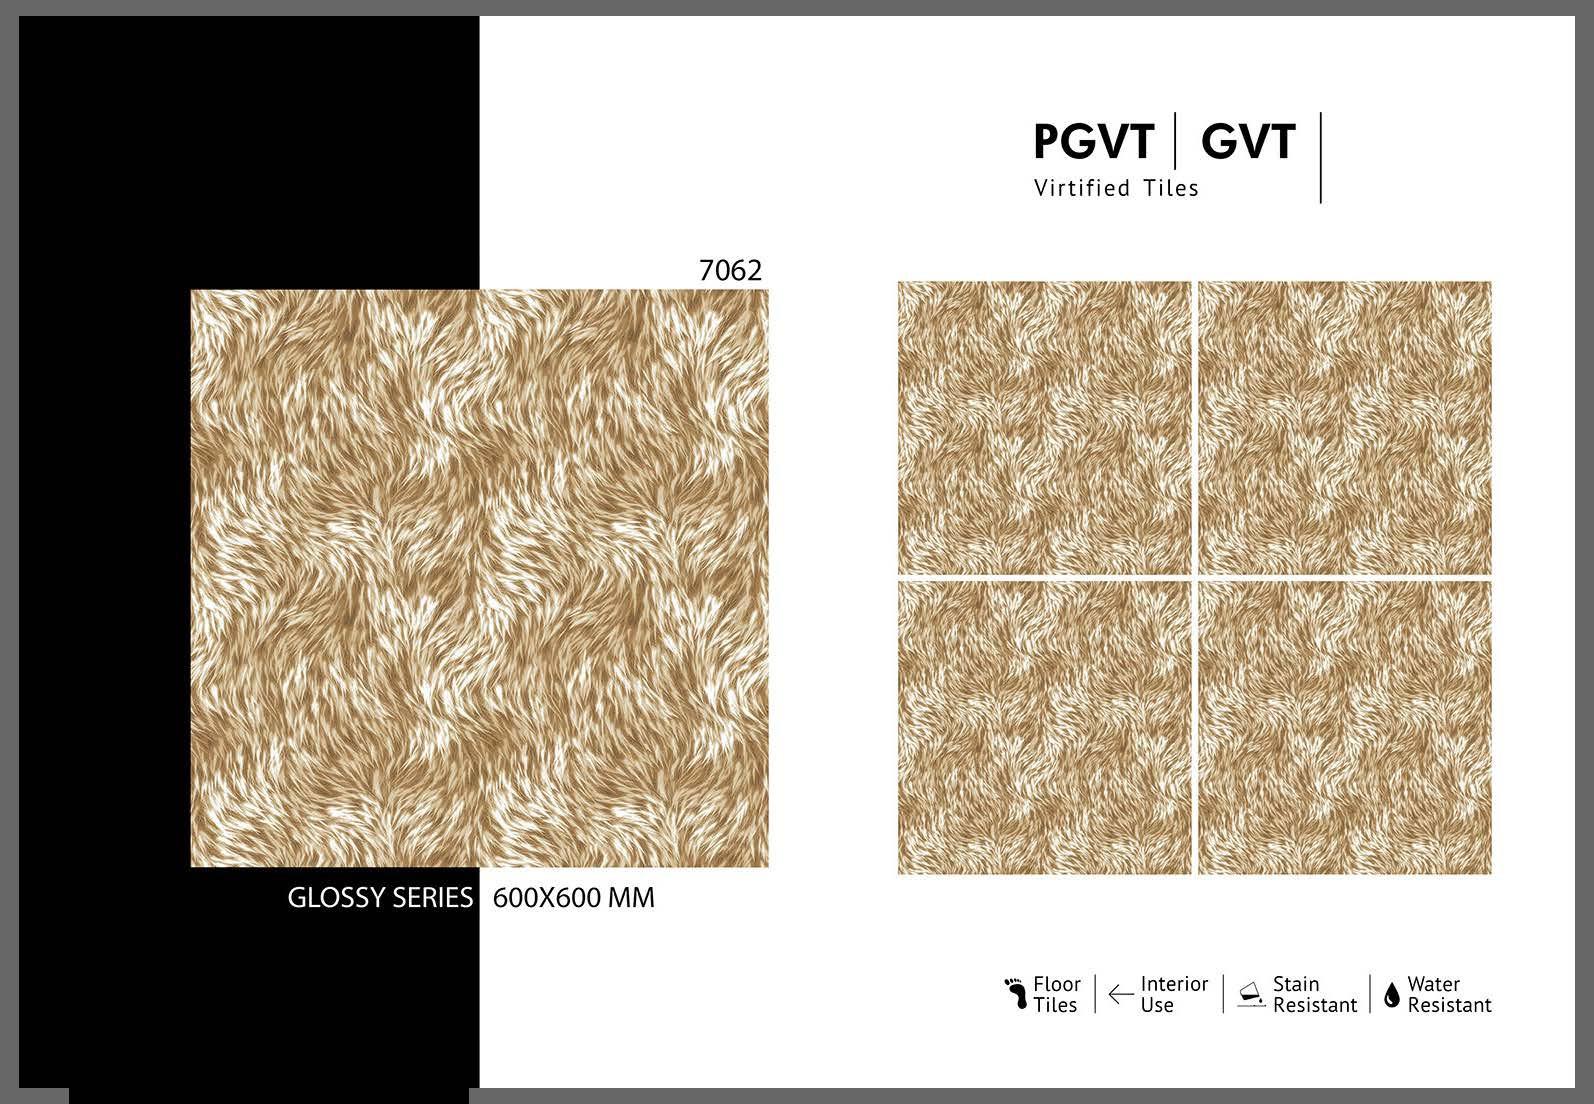 GVT 2X2 GLOSSY_Page_49.jpg